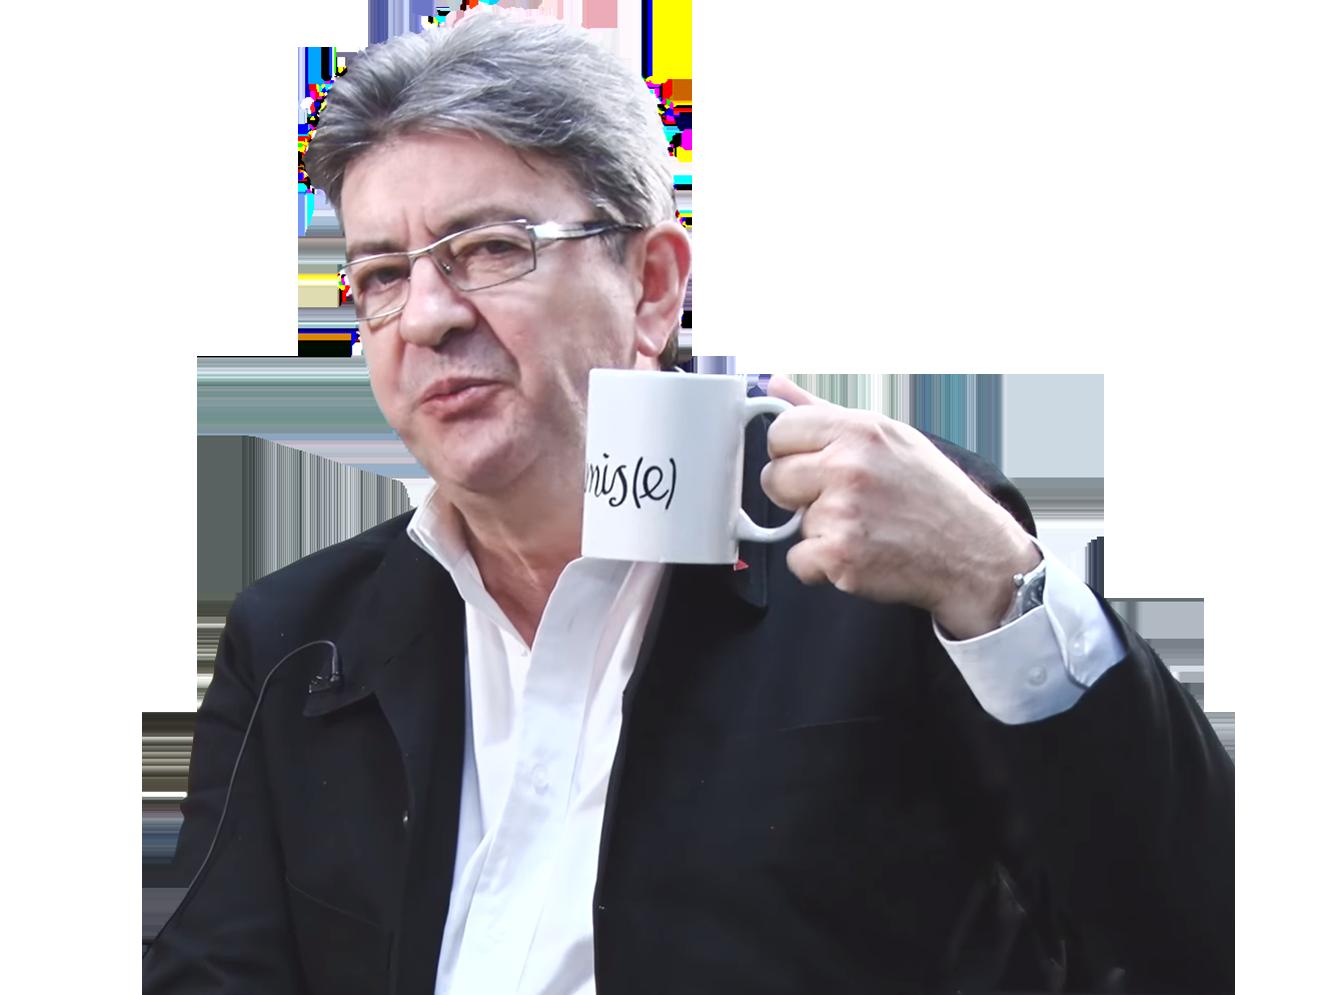 Sticker jean luc melenchon tasse insoumise